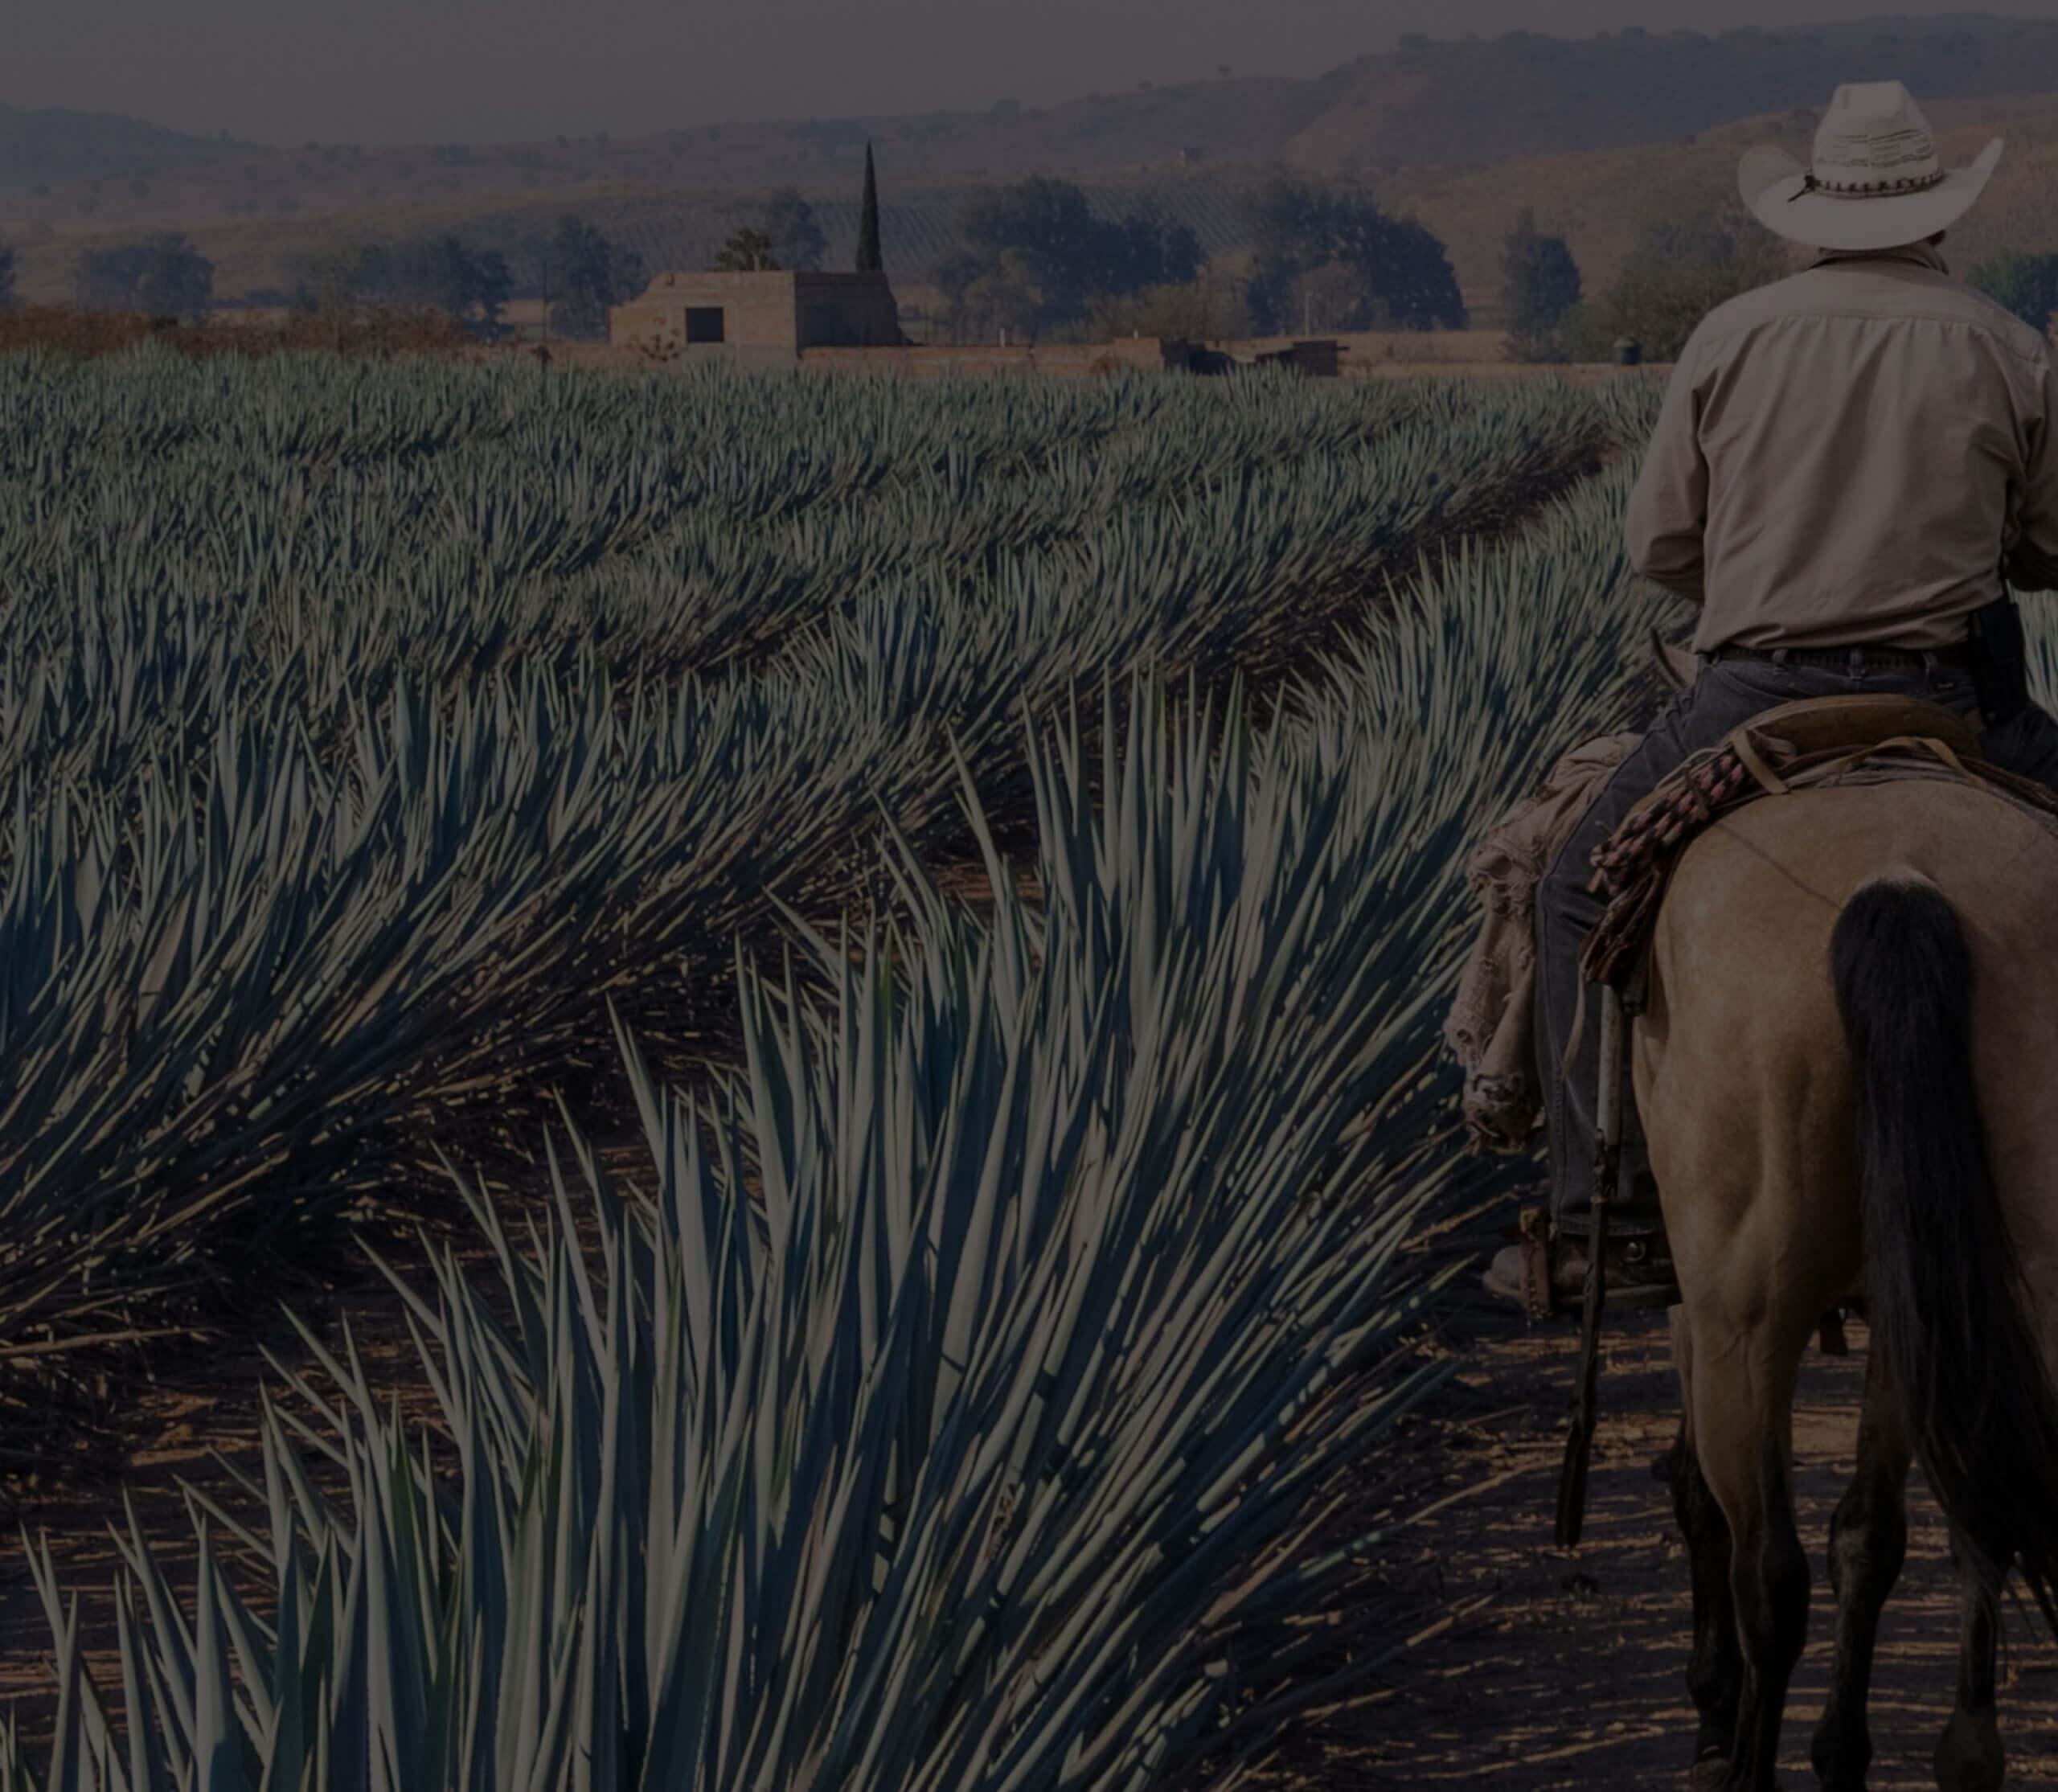 los arango tequila jimador in blue weber estate agave field